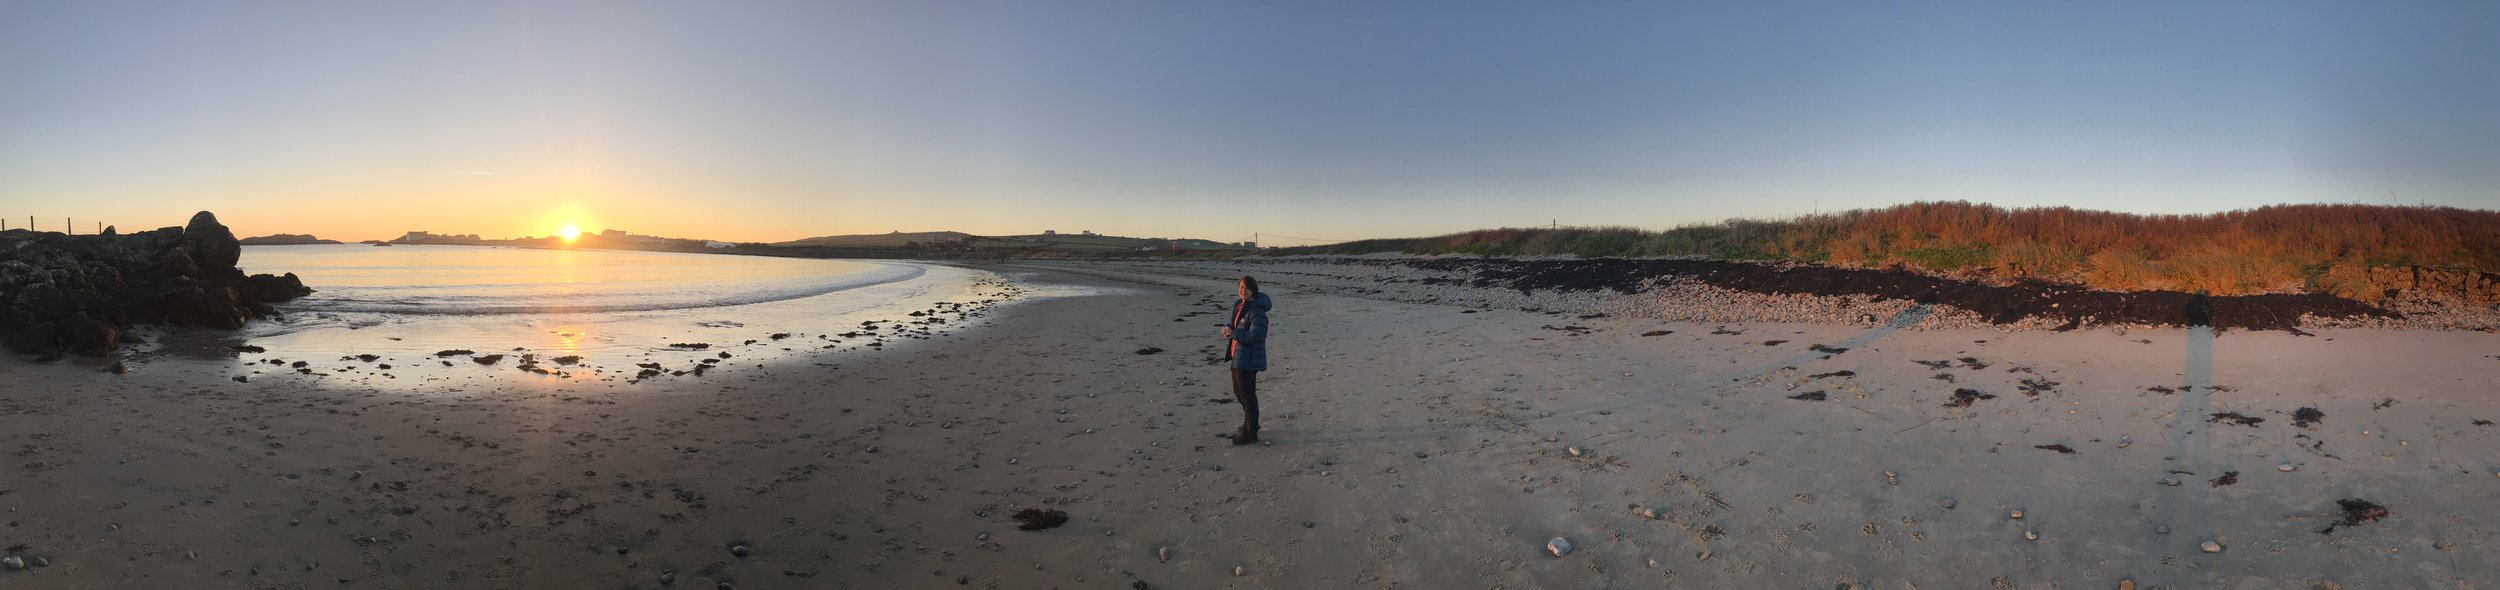 Rhoscolyn Beach at sunset